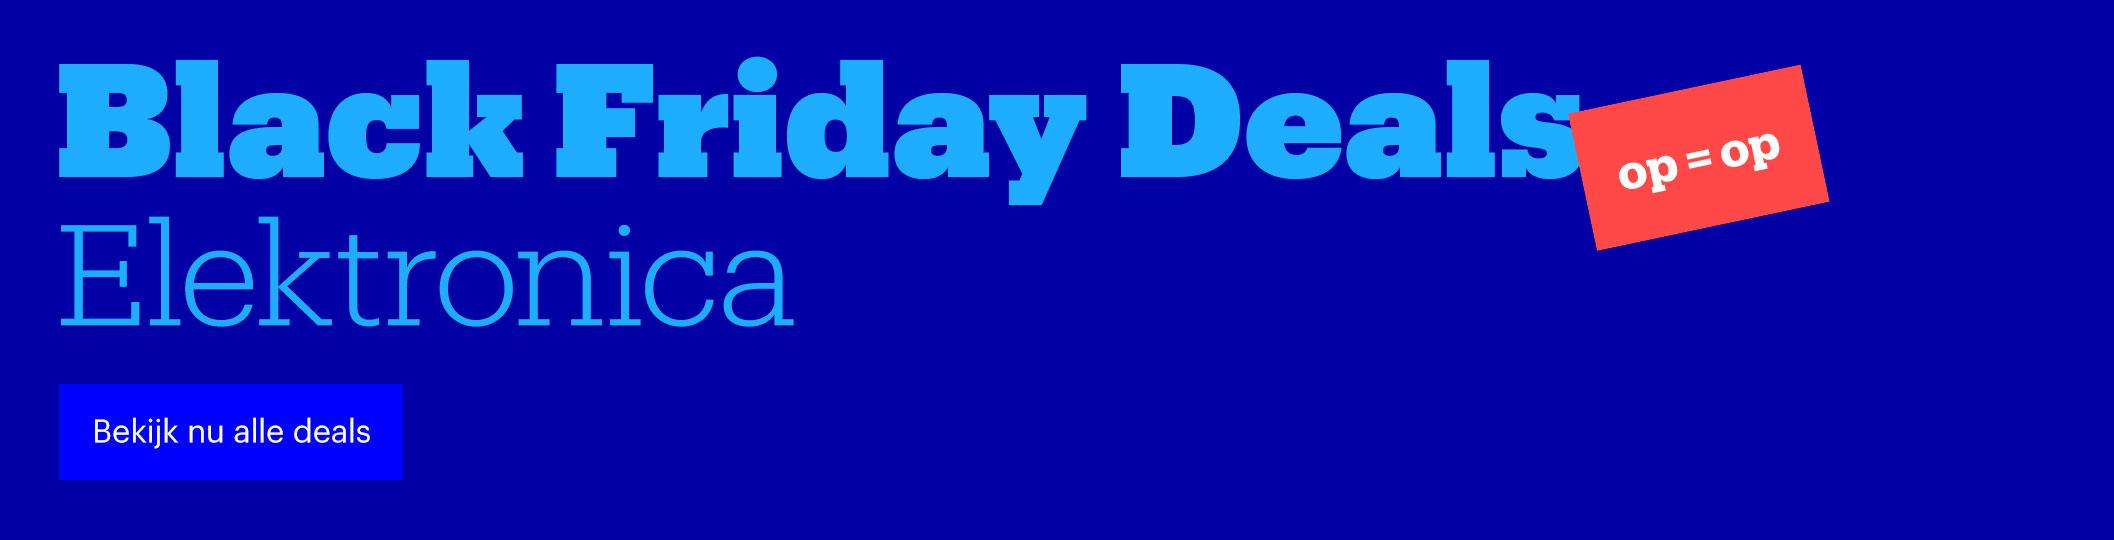 Black Friday deals | Elektronica